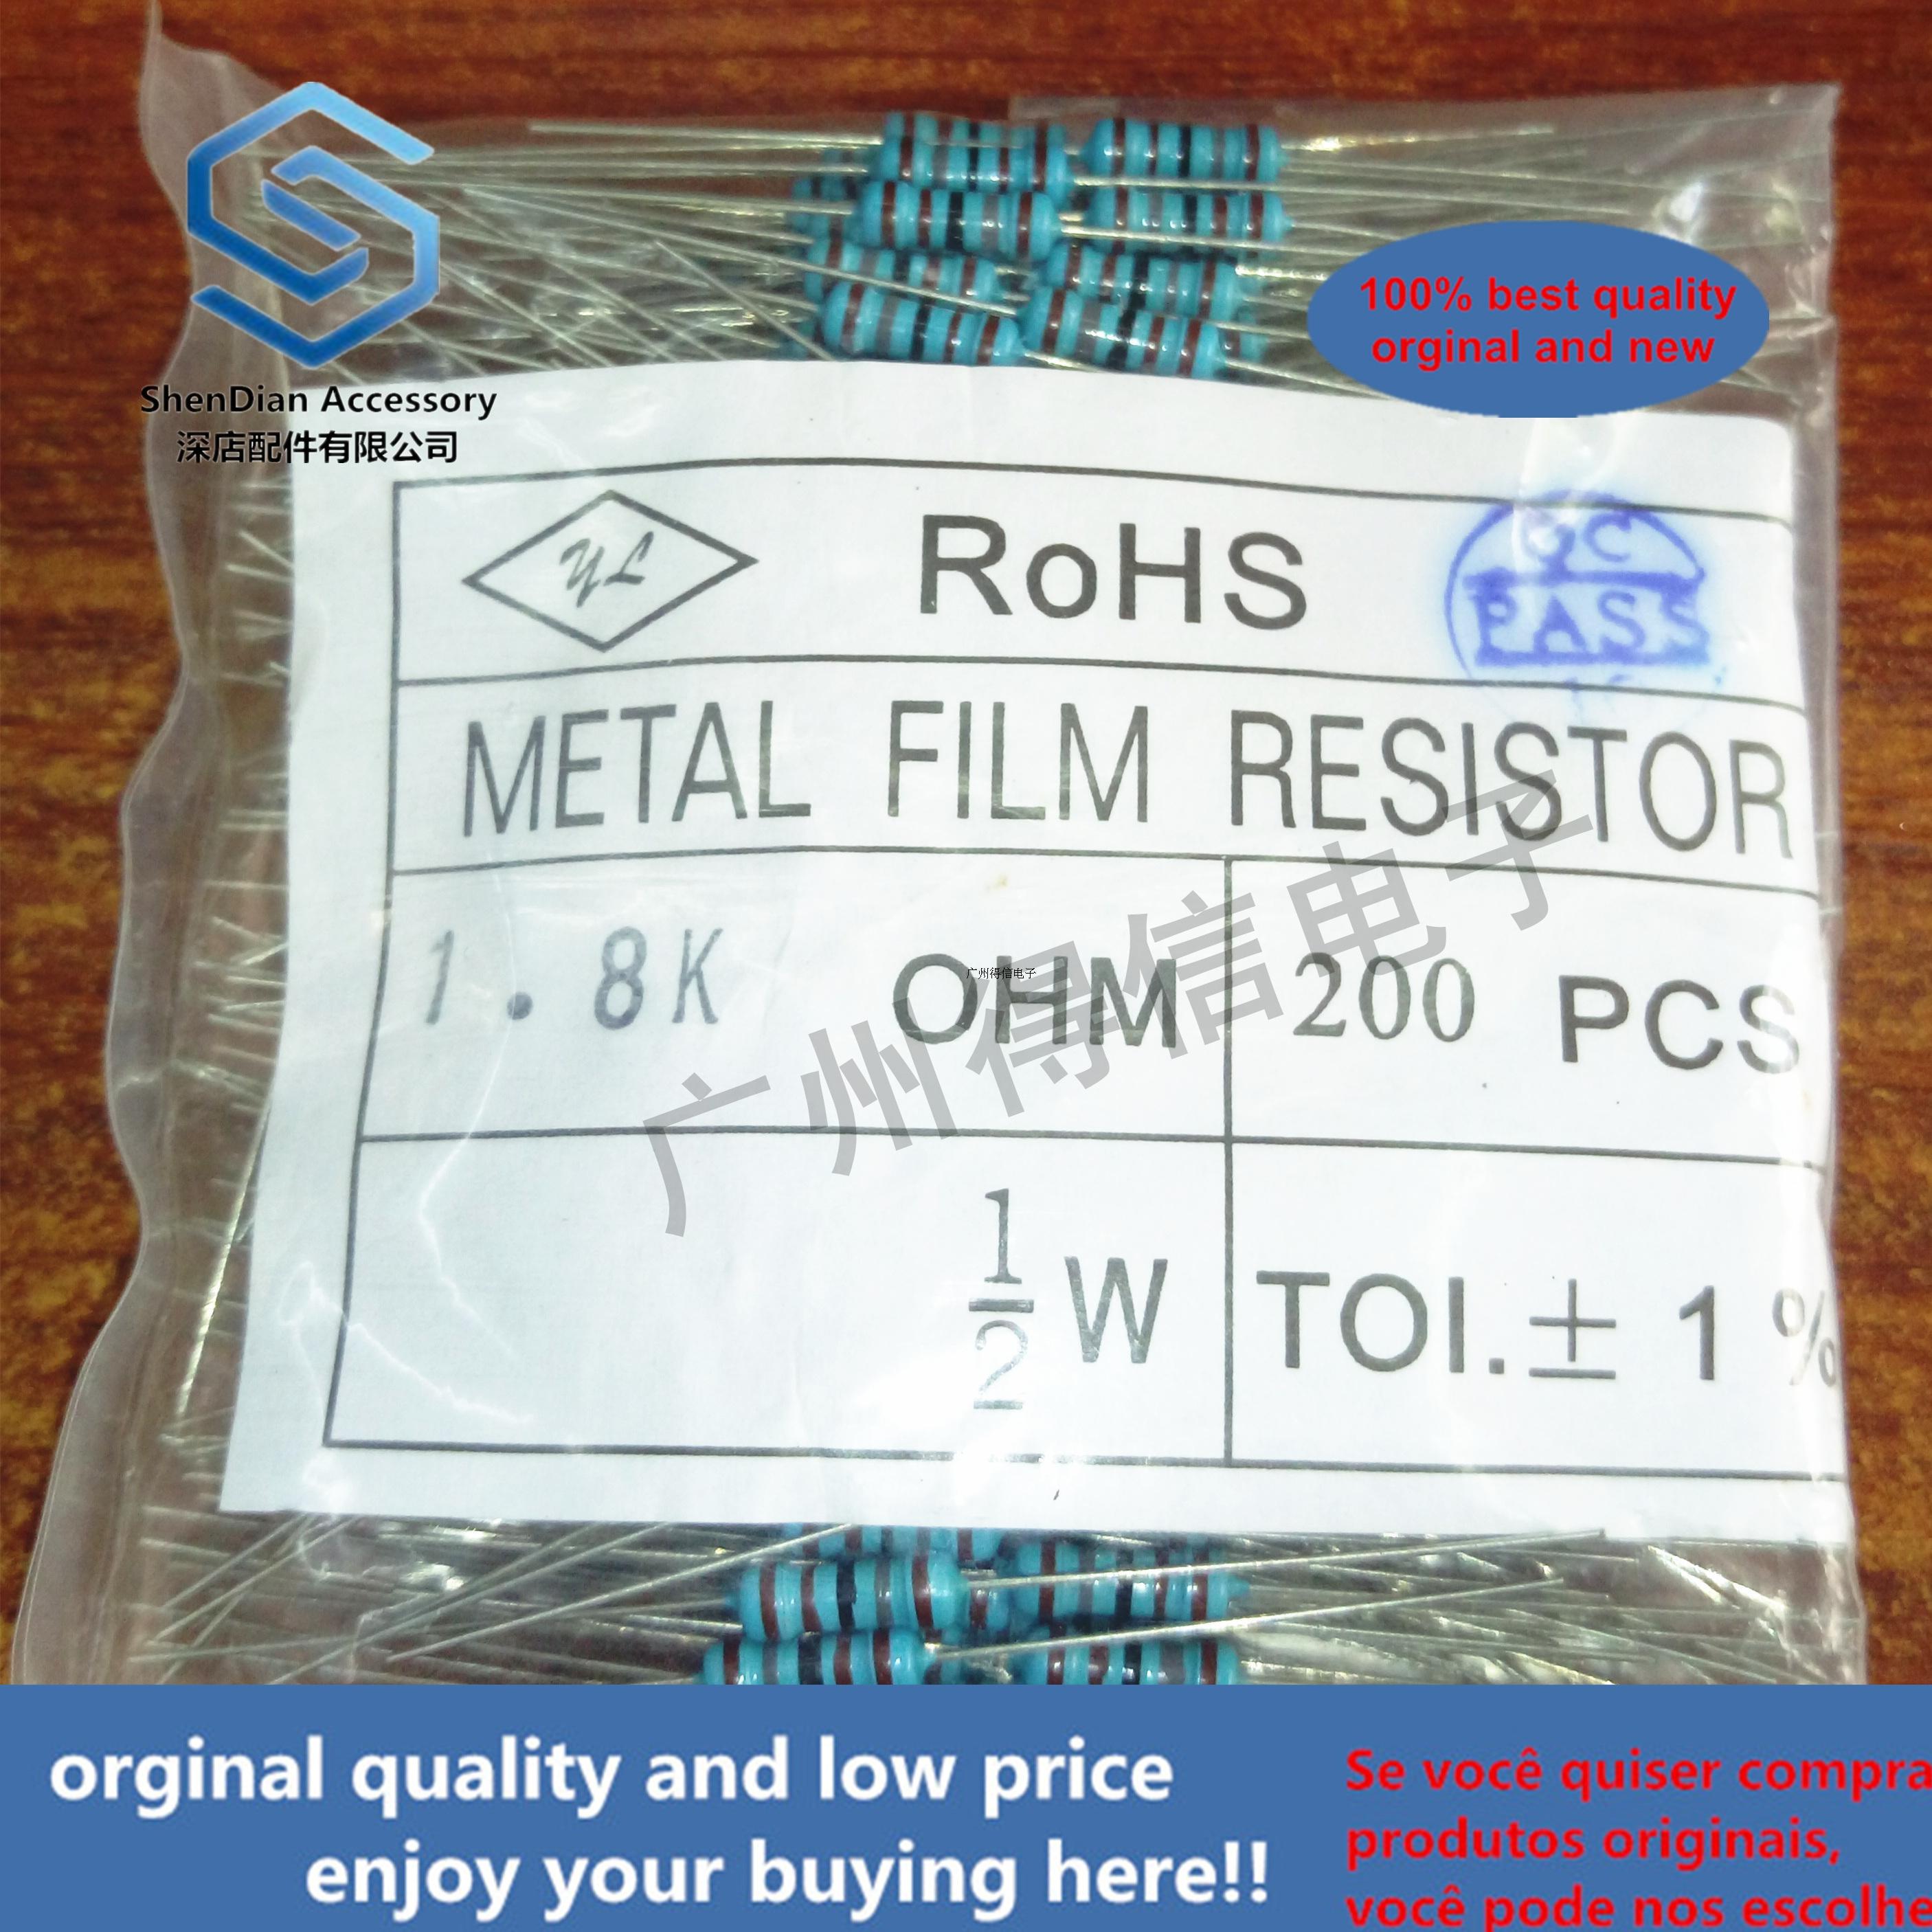 200pcs 1 / 2W 12K 1% Brand New Metal Film Iron Feet Resistor Bag 200 Pcs Per Pack